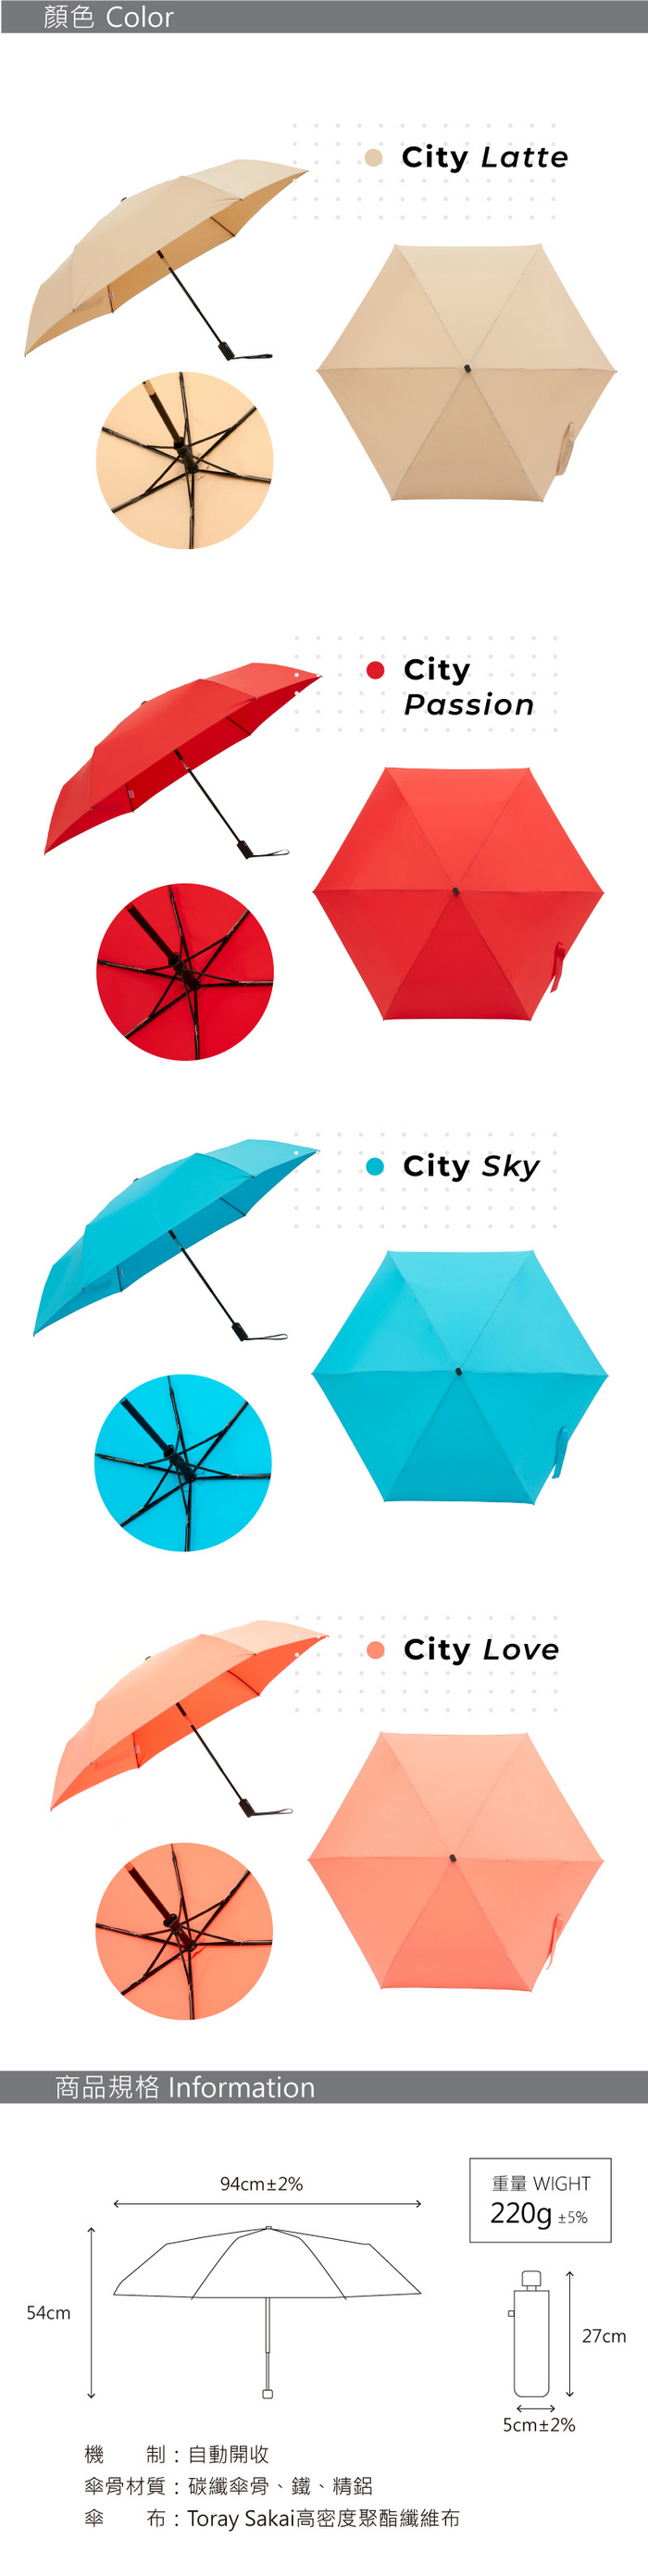 MECOVER City Auto東麗酒伊面料超輕扁平自動傘-Sky(藍色)